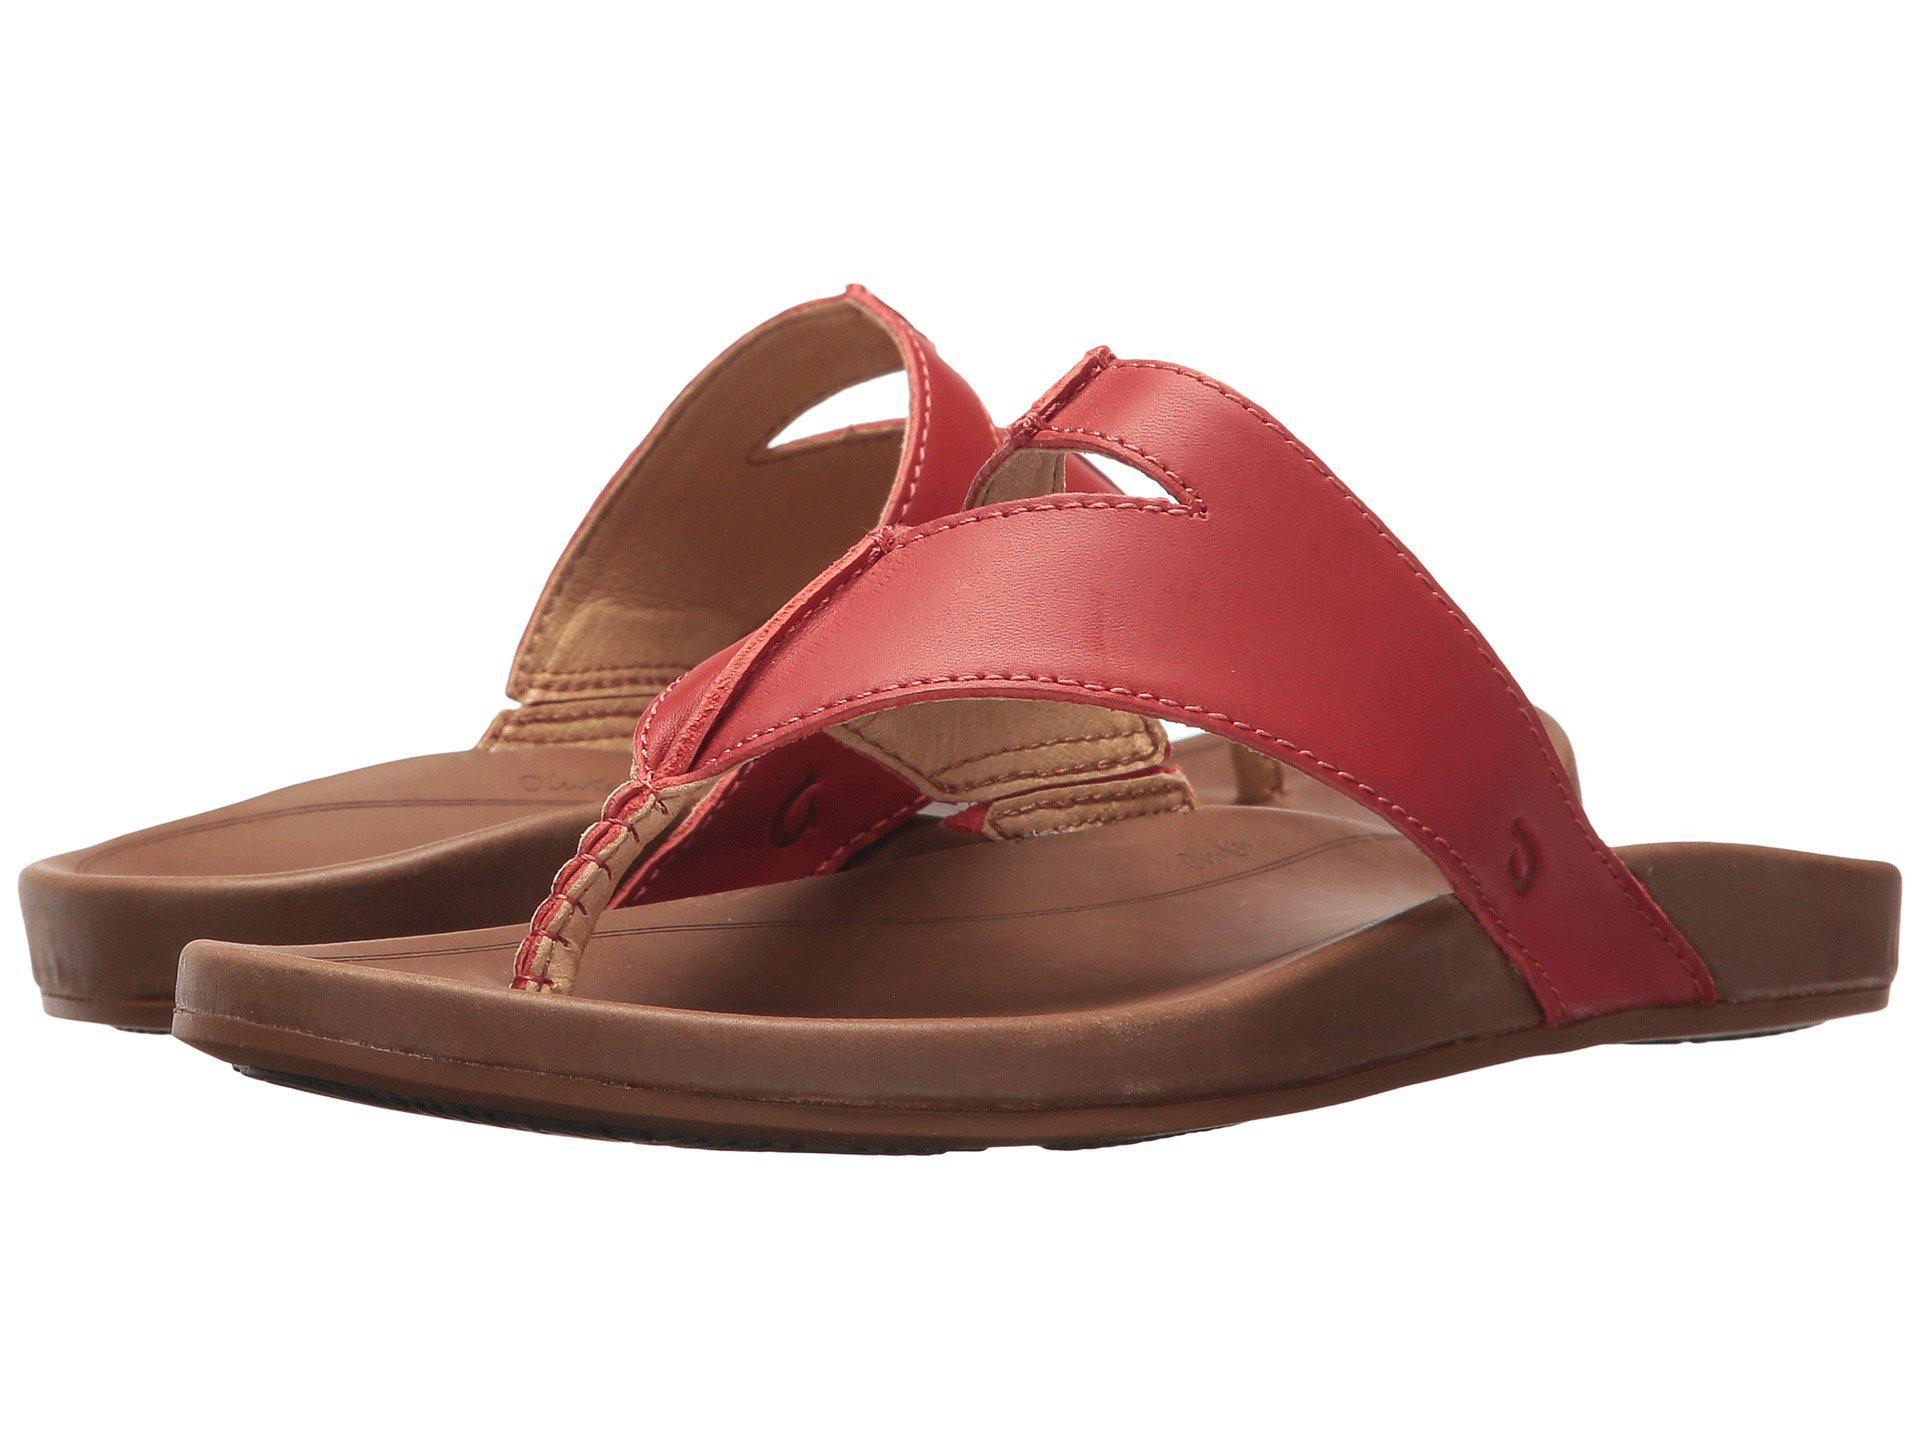 a088bc38e728 Lyst - Olukai Lala (black tan) Women s Sandals